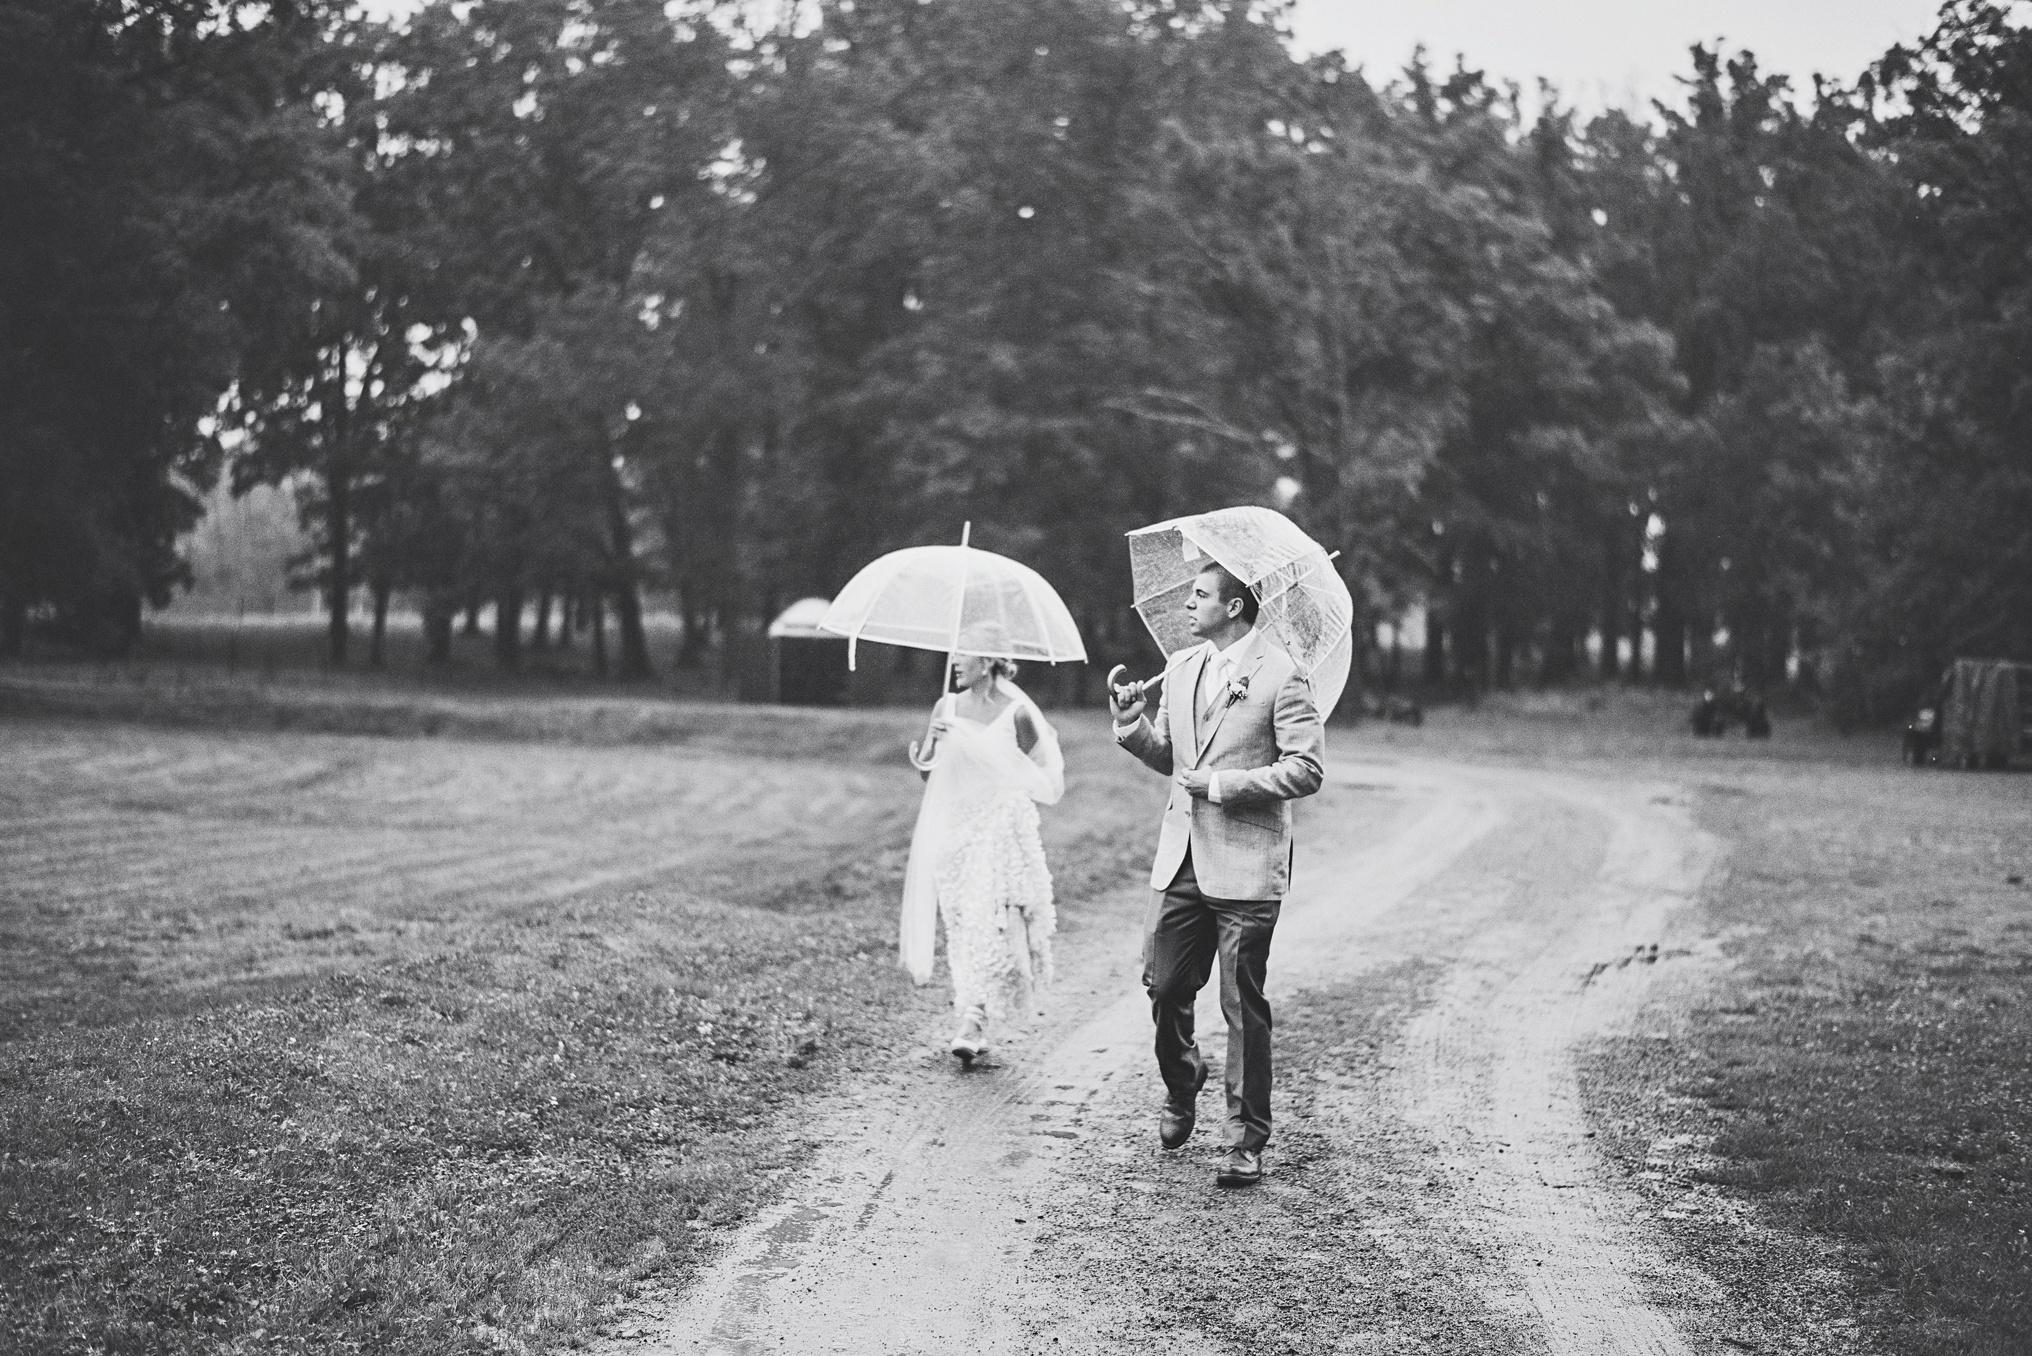 best_wedding_photography_2017_by_lucas_botz_photography_006.jpg